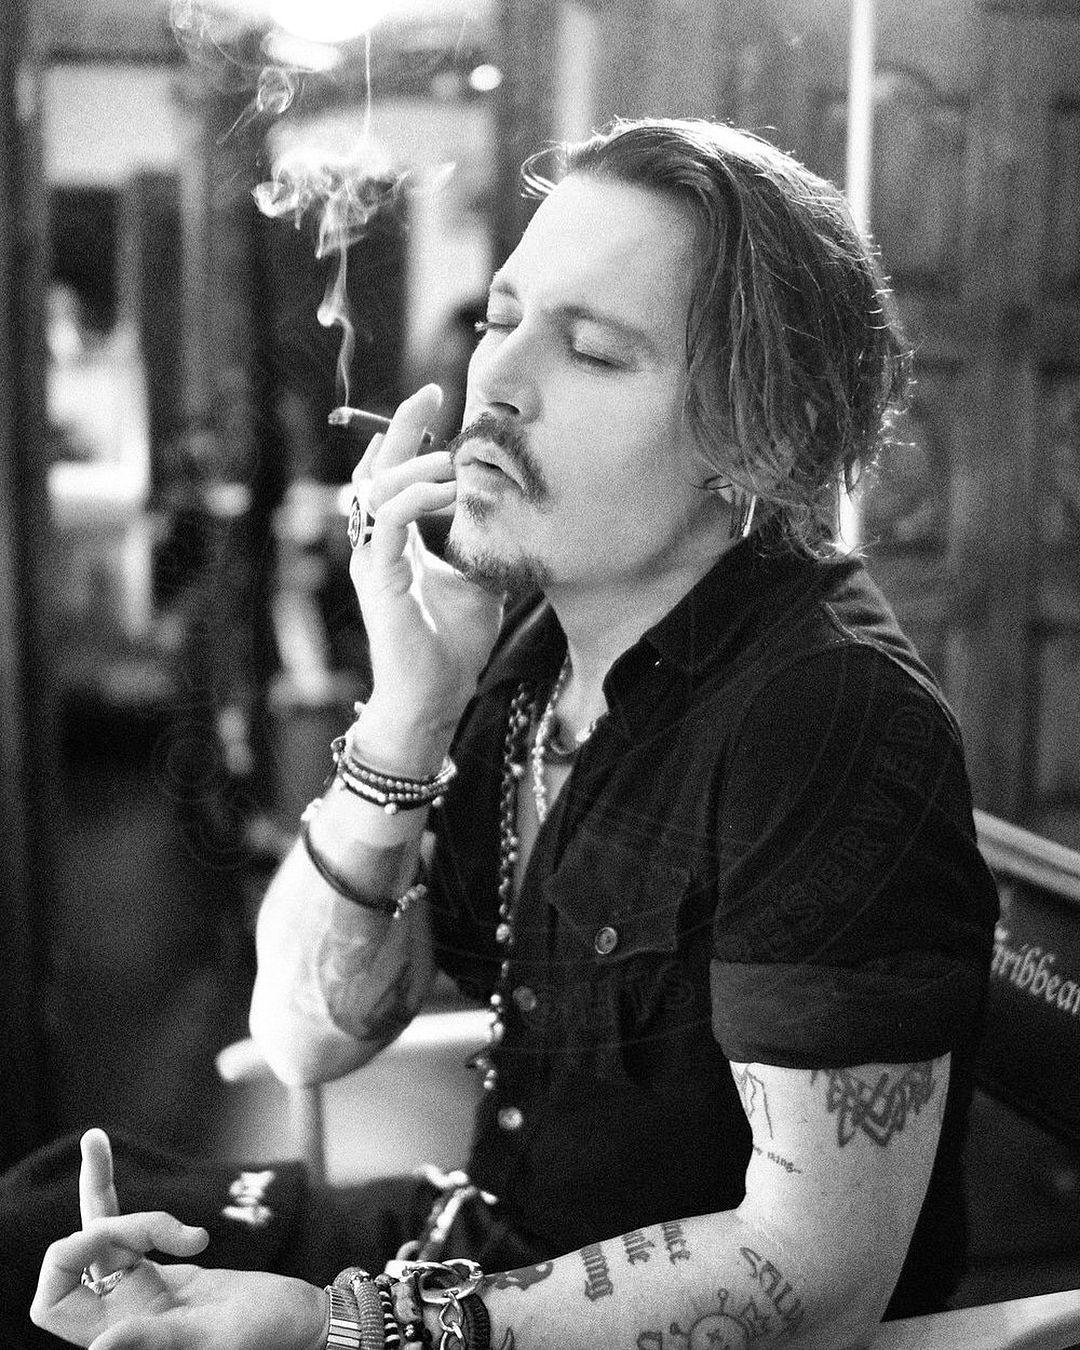 656 Likes 11 Comments Johnny Depp Depp Diary On Instagram